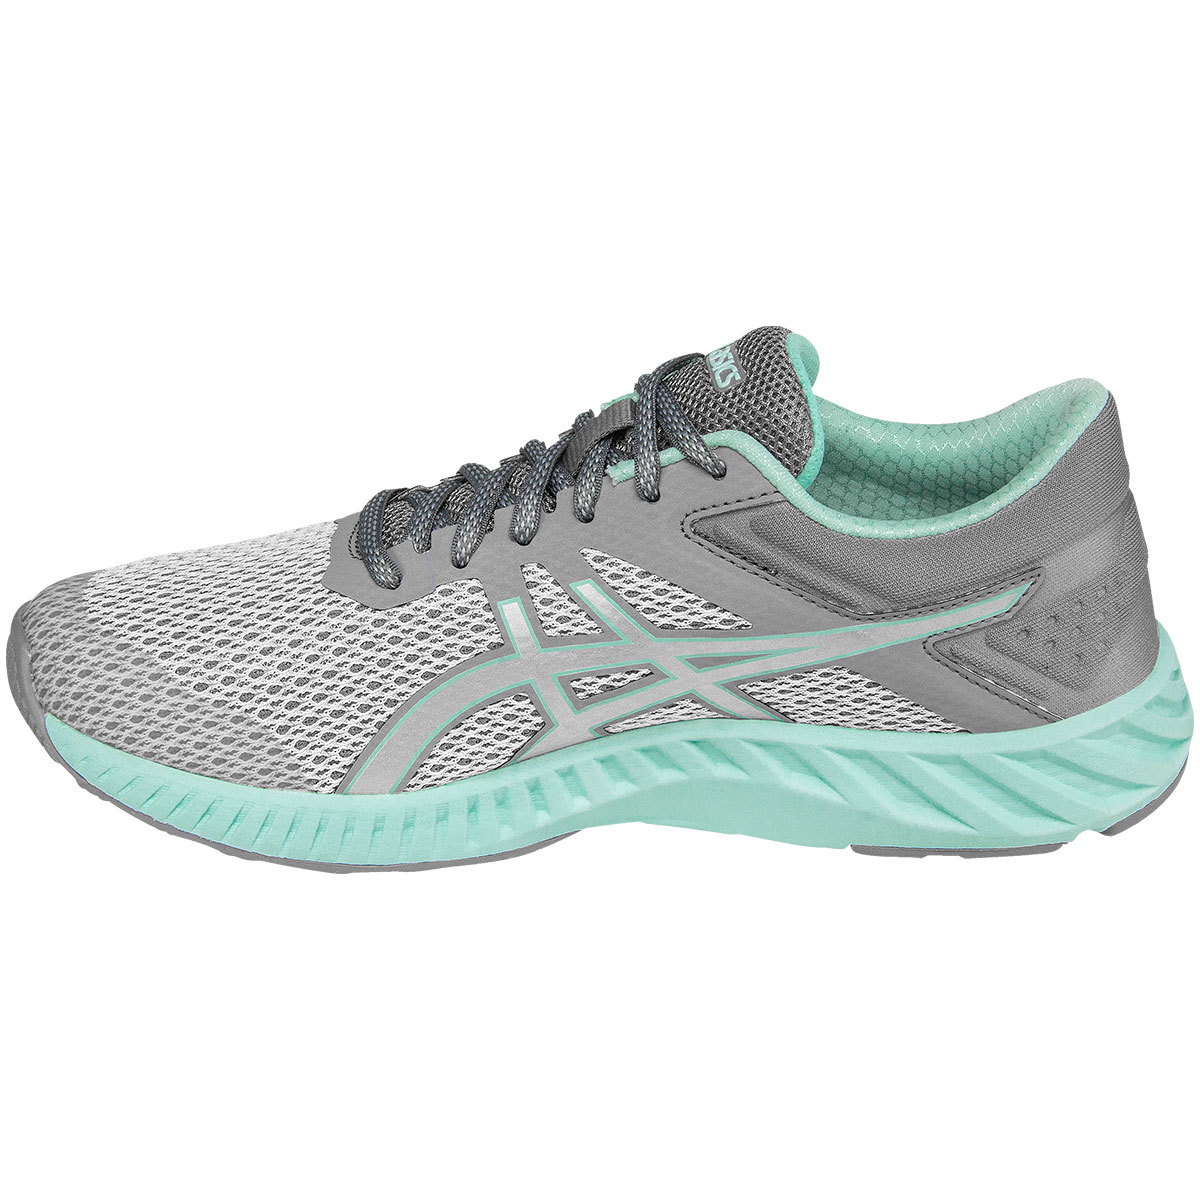 FuzeX Lyte 2 Running Shoes, Mid Grey